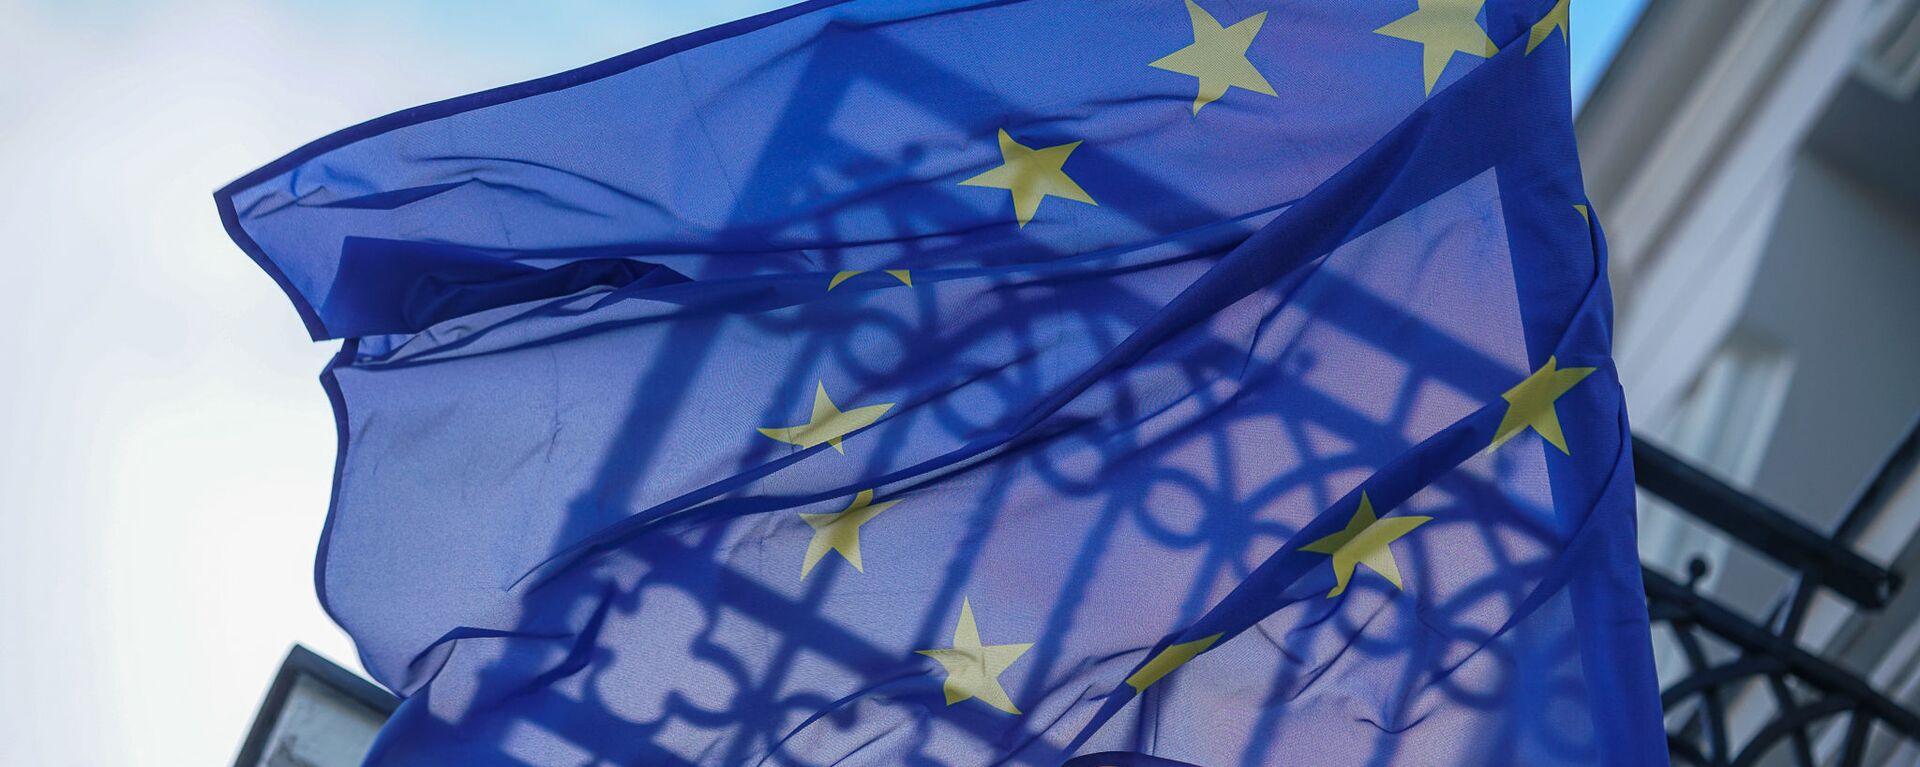 Флаг Евросоюза на здании в Риге - Sputnik Latvija, 1920, 06.10.2021